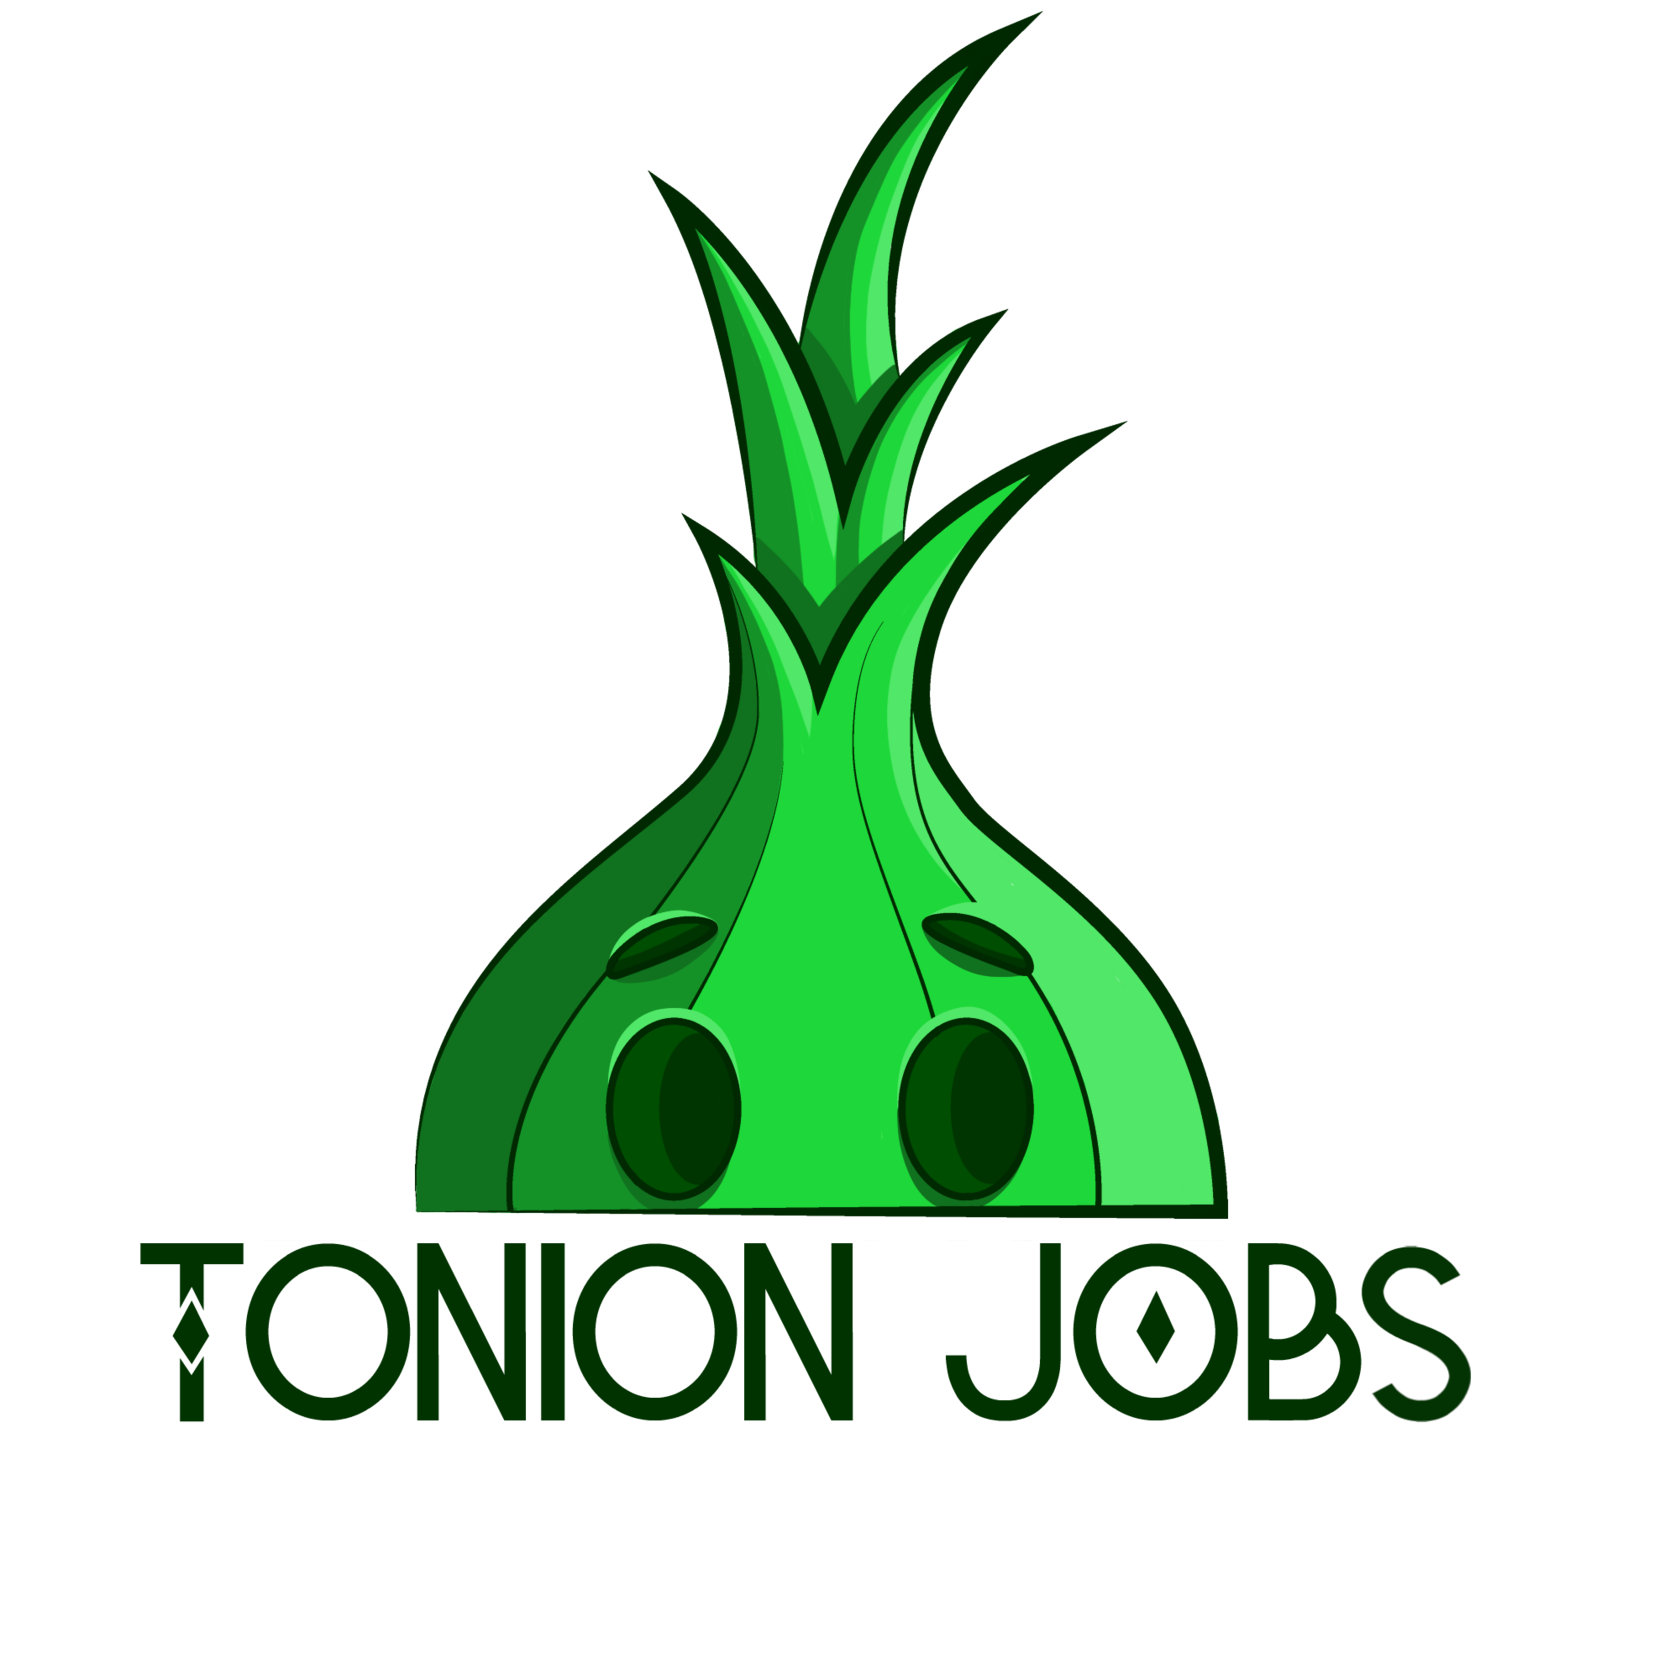 Tonion Jobs